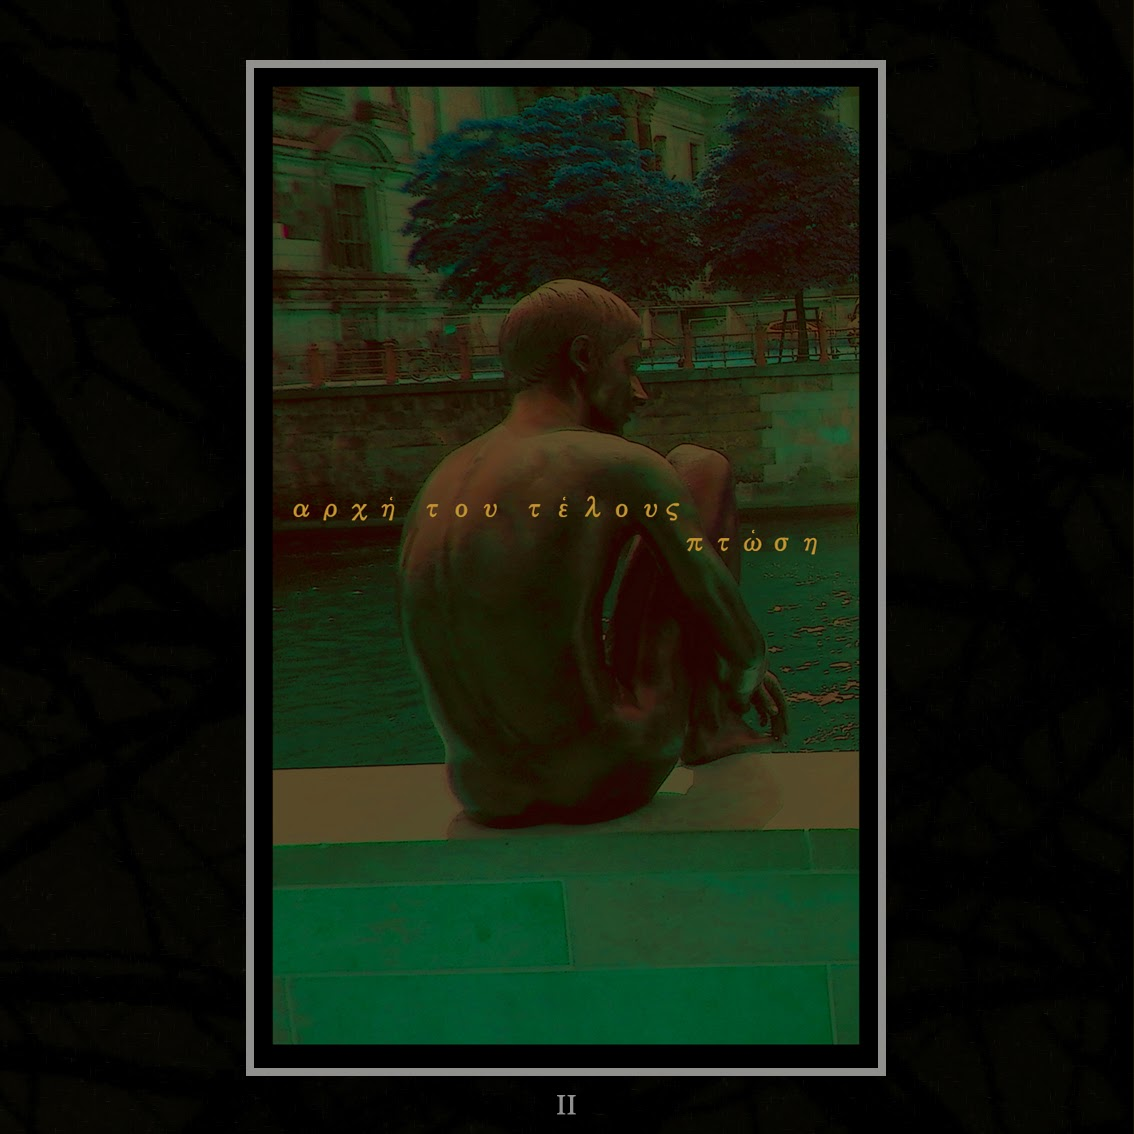 New Album: Αρχή του τέλους - Πτώση